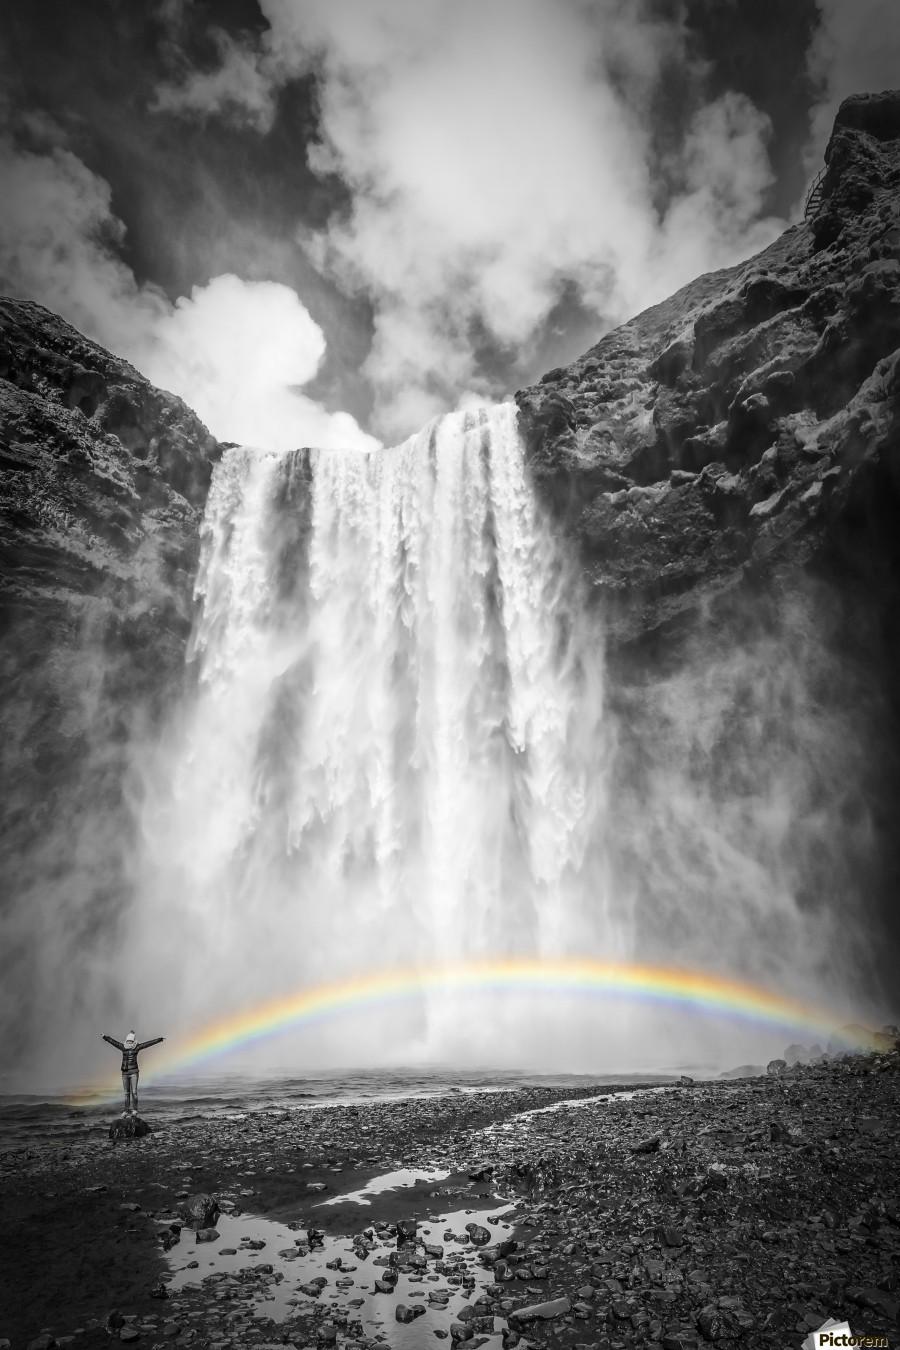 ICELAND Skogafoss , Melanie Viola , Iceland, Skogafoss, Skógafoss, South Iceland, south, Skógar, Skógá, Lýðveldið Ísland, foam, falls, waterfall, idyllic, landscape, nature, decorative, rainbow, Europe, sunny, sunlight, clouds, clear, sky, spring, cliff, double rainbow, people,